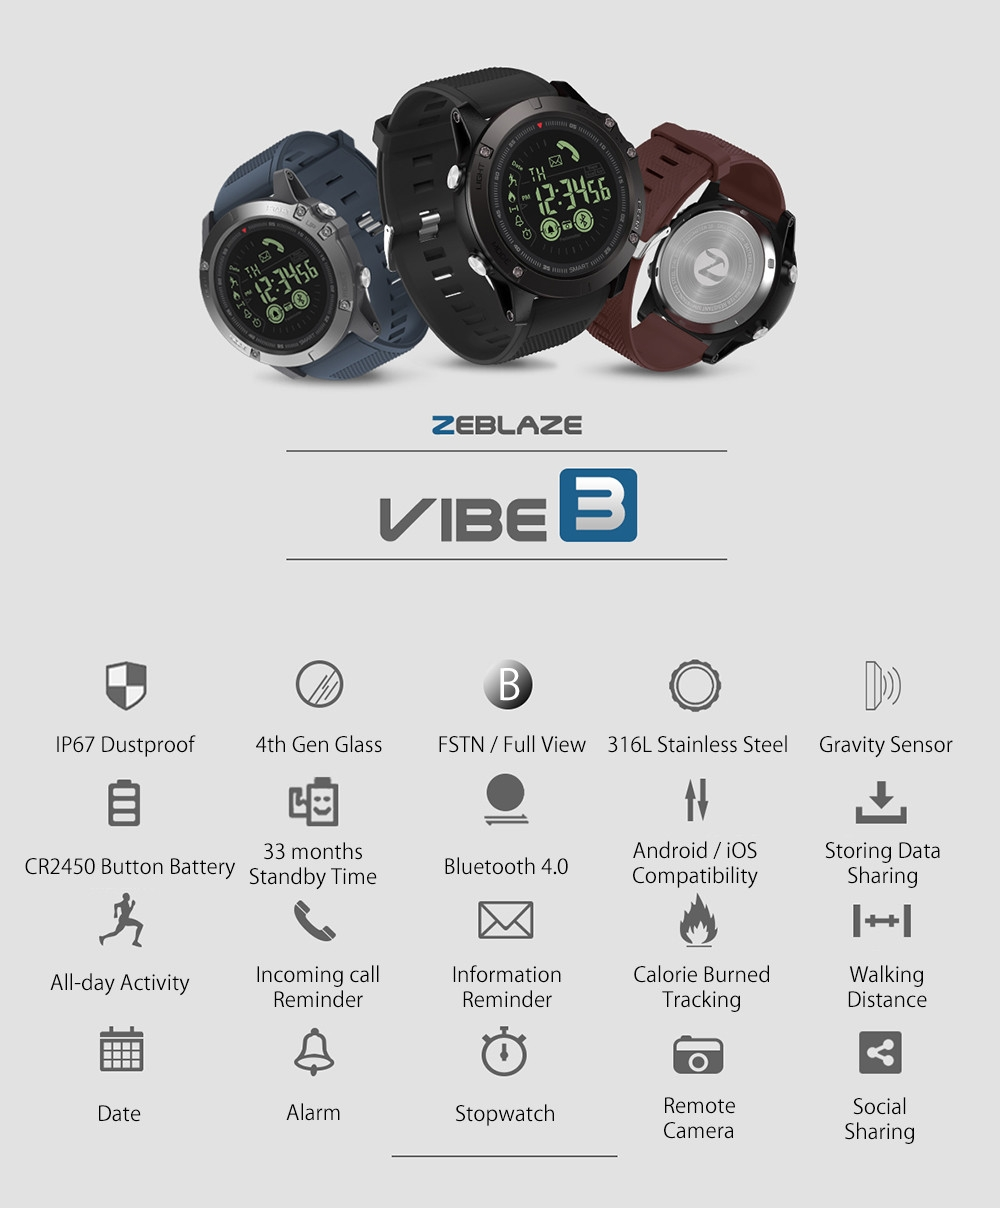 Zeblaze VIBE 3 Smart Watch Luminous Dial Low Battery Remind Moments Share Wristband